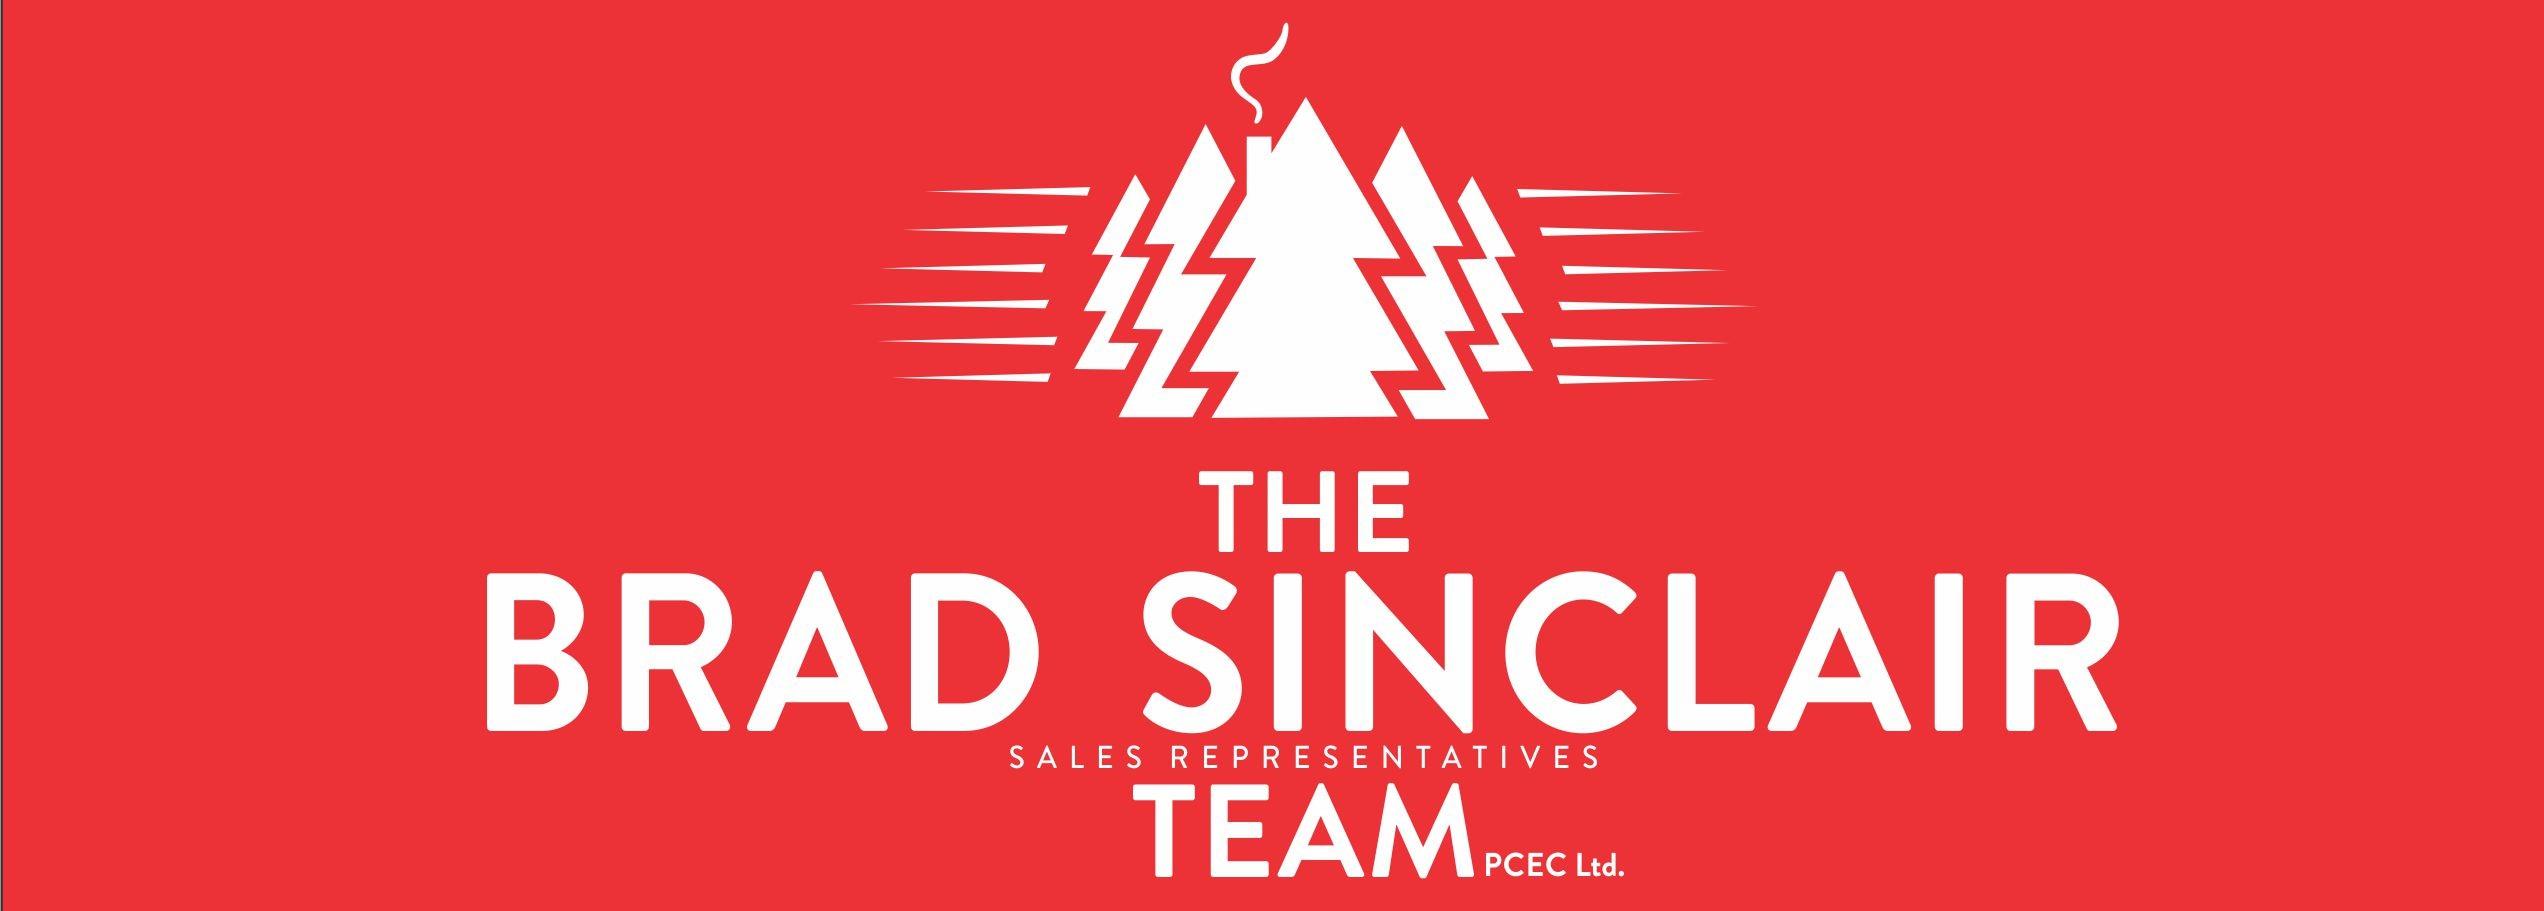 The Brad Sinclair Team - PREC Ltd. Logo